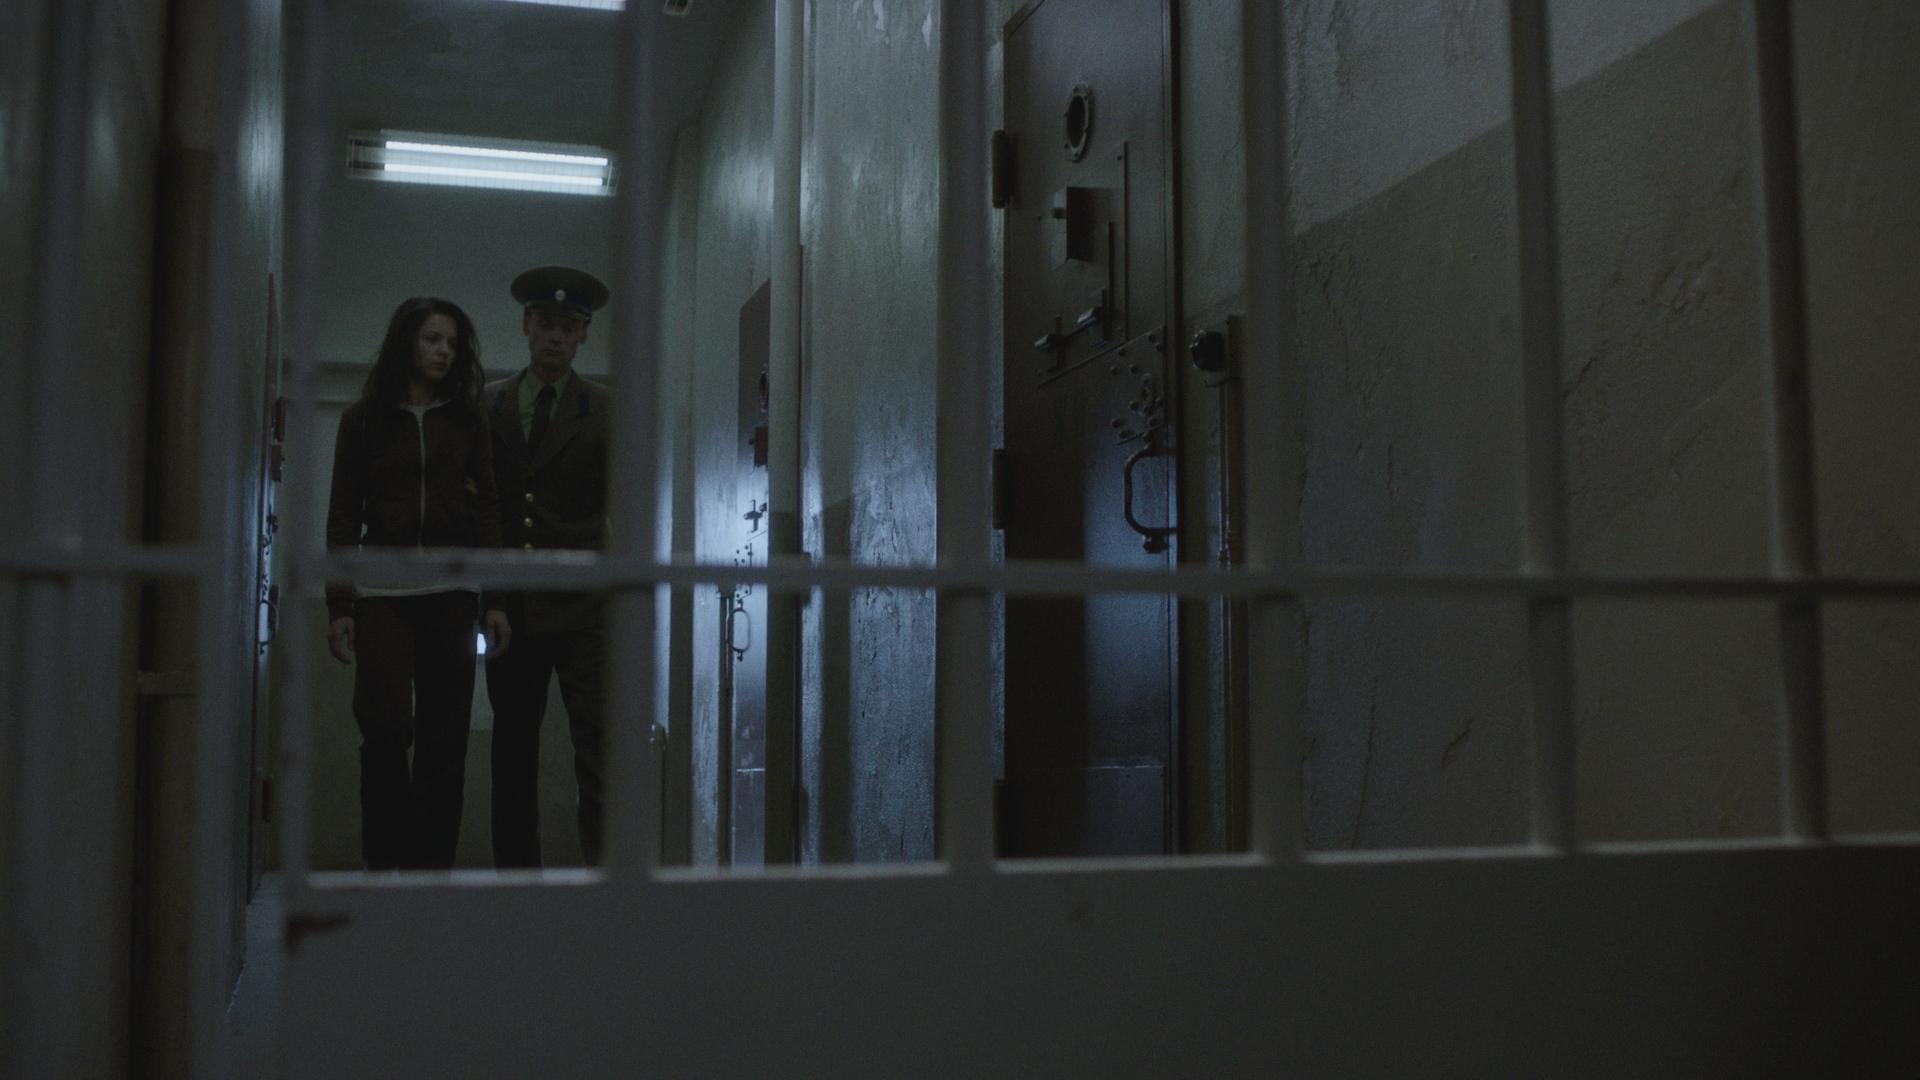 14 302_Sc71_2 prison.jpg